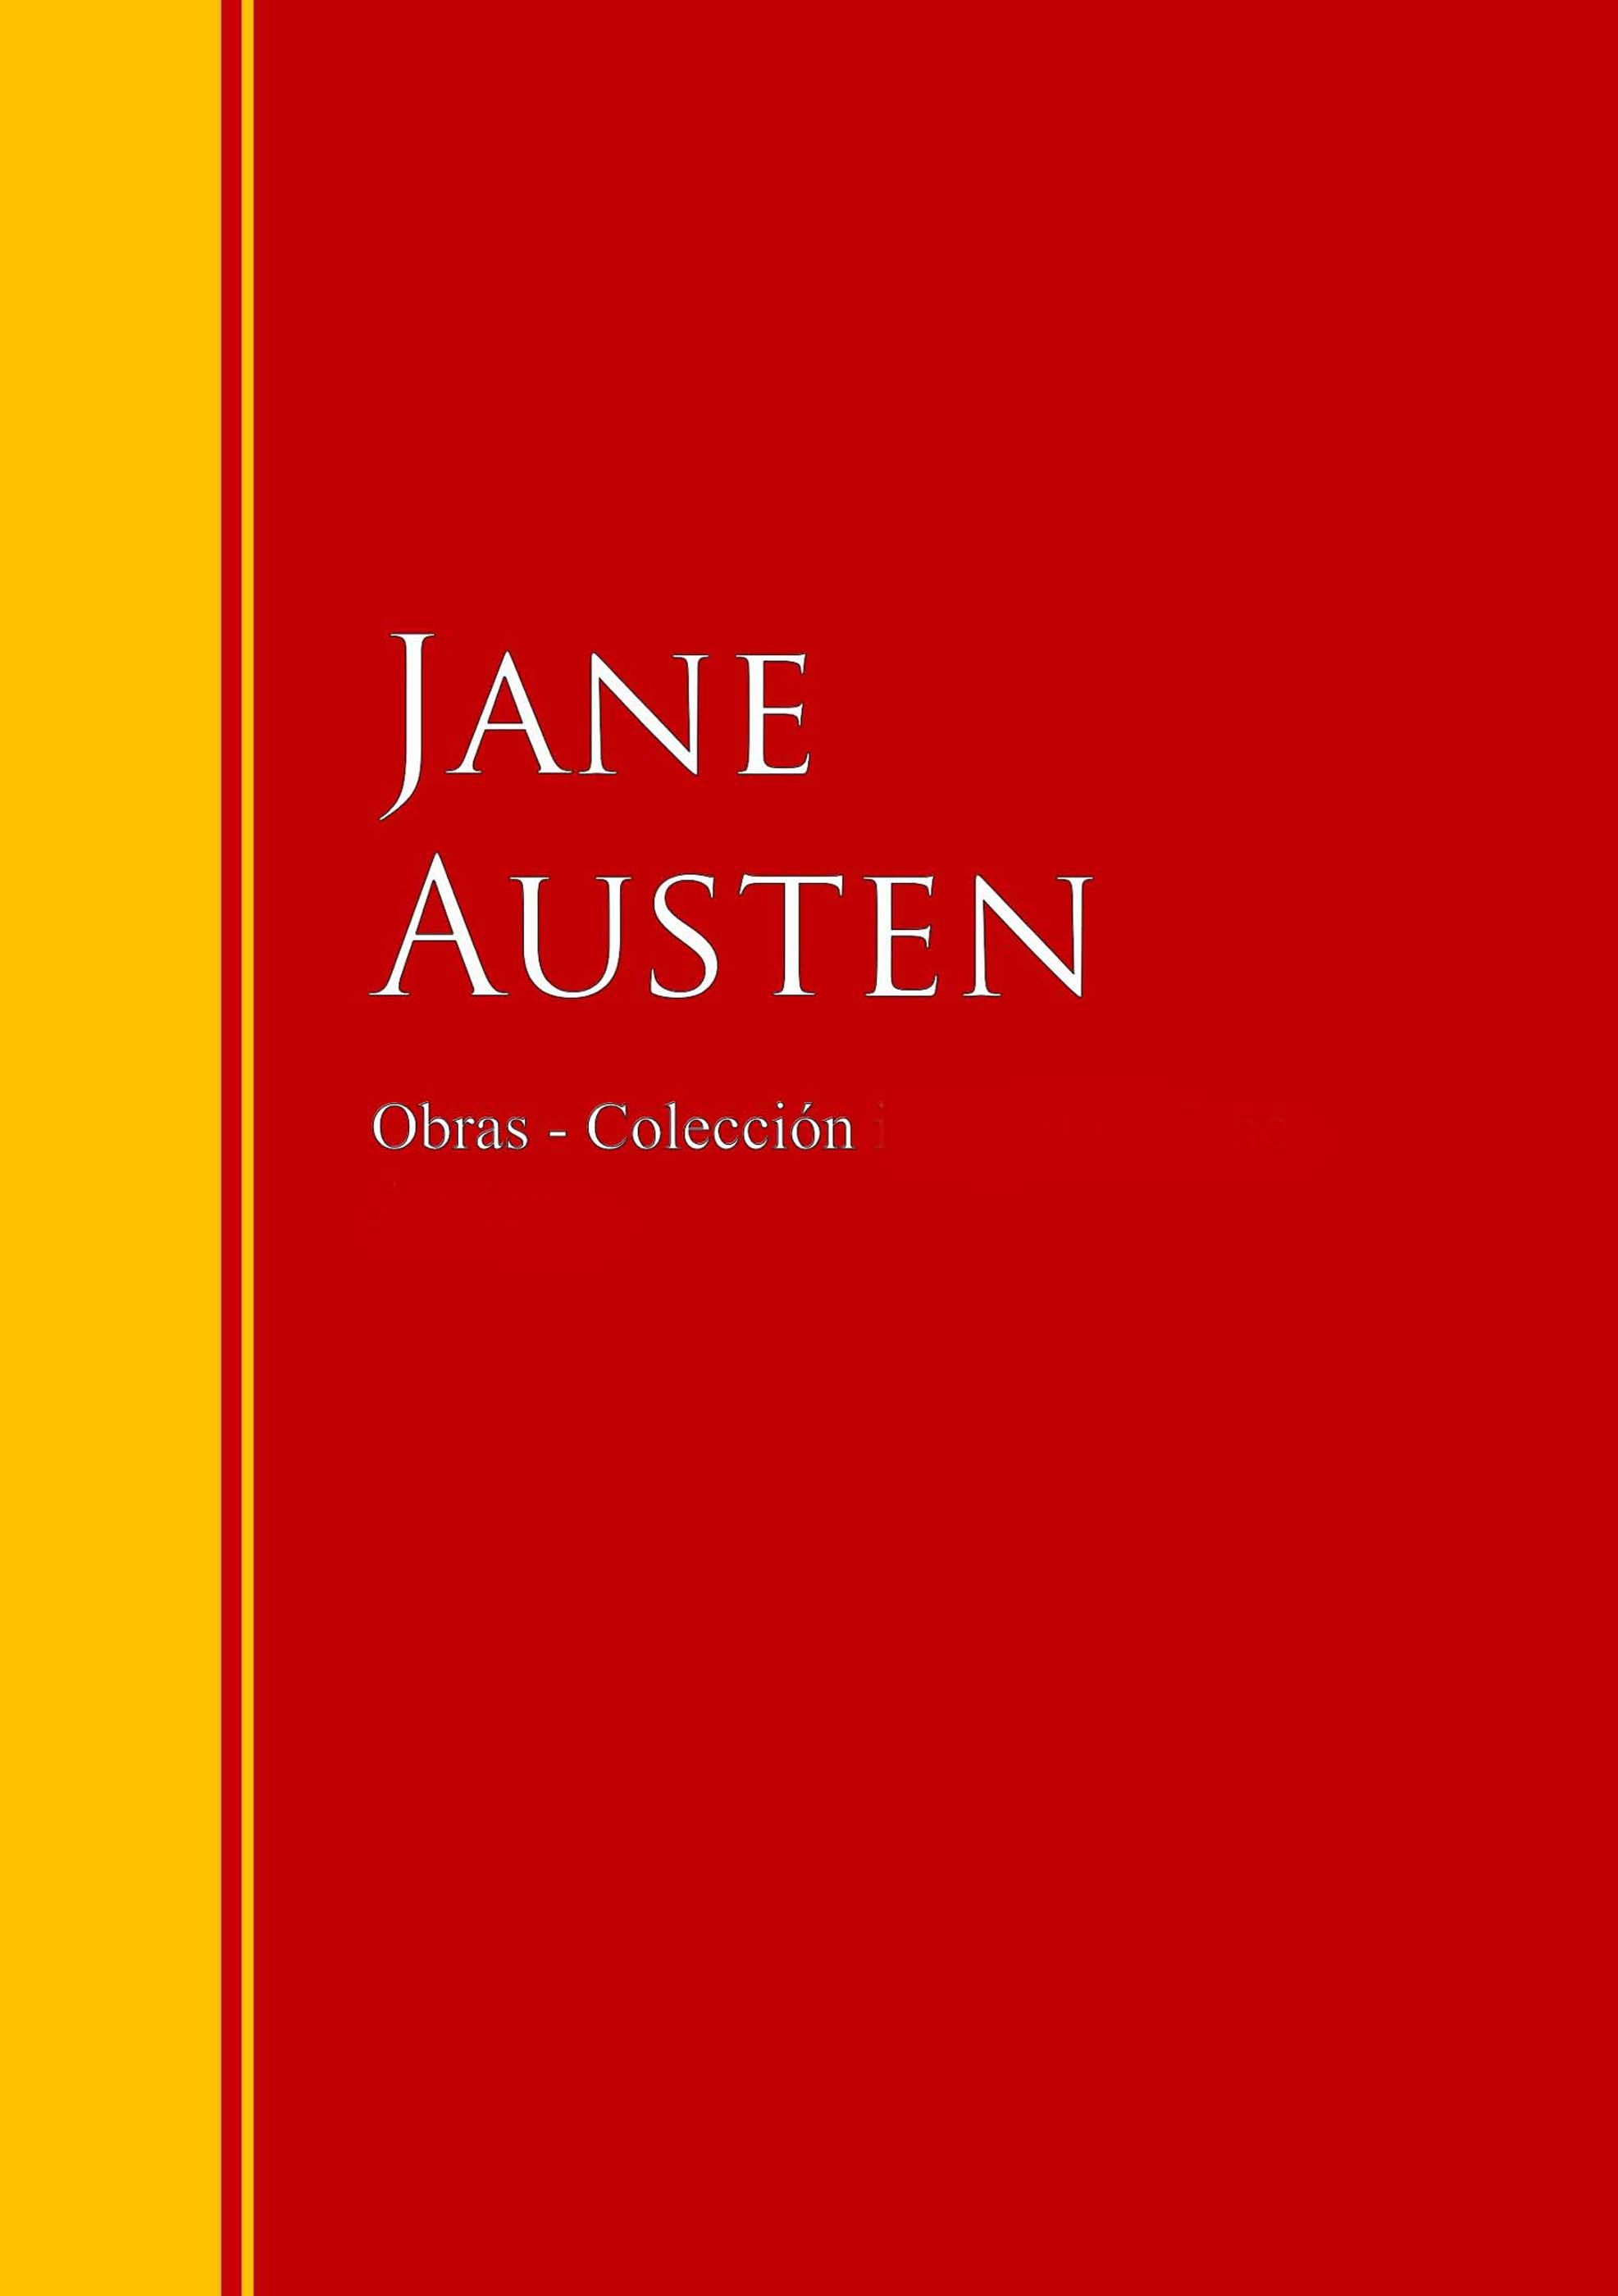 Фото - Jane Austen Obras - Colección de Jane Austen jane austen persuasion